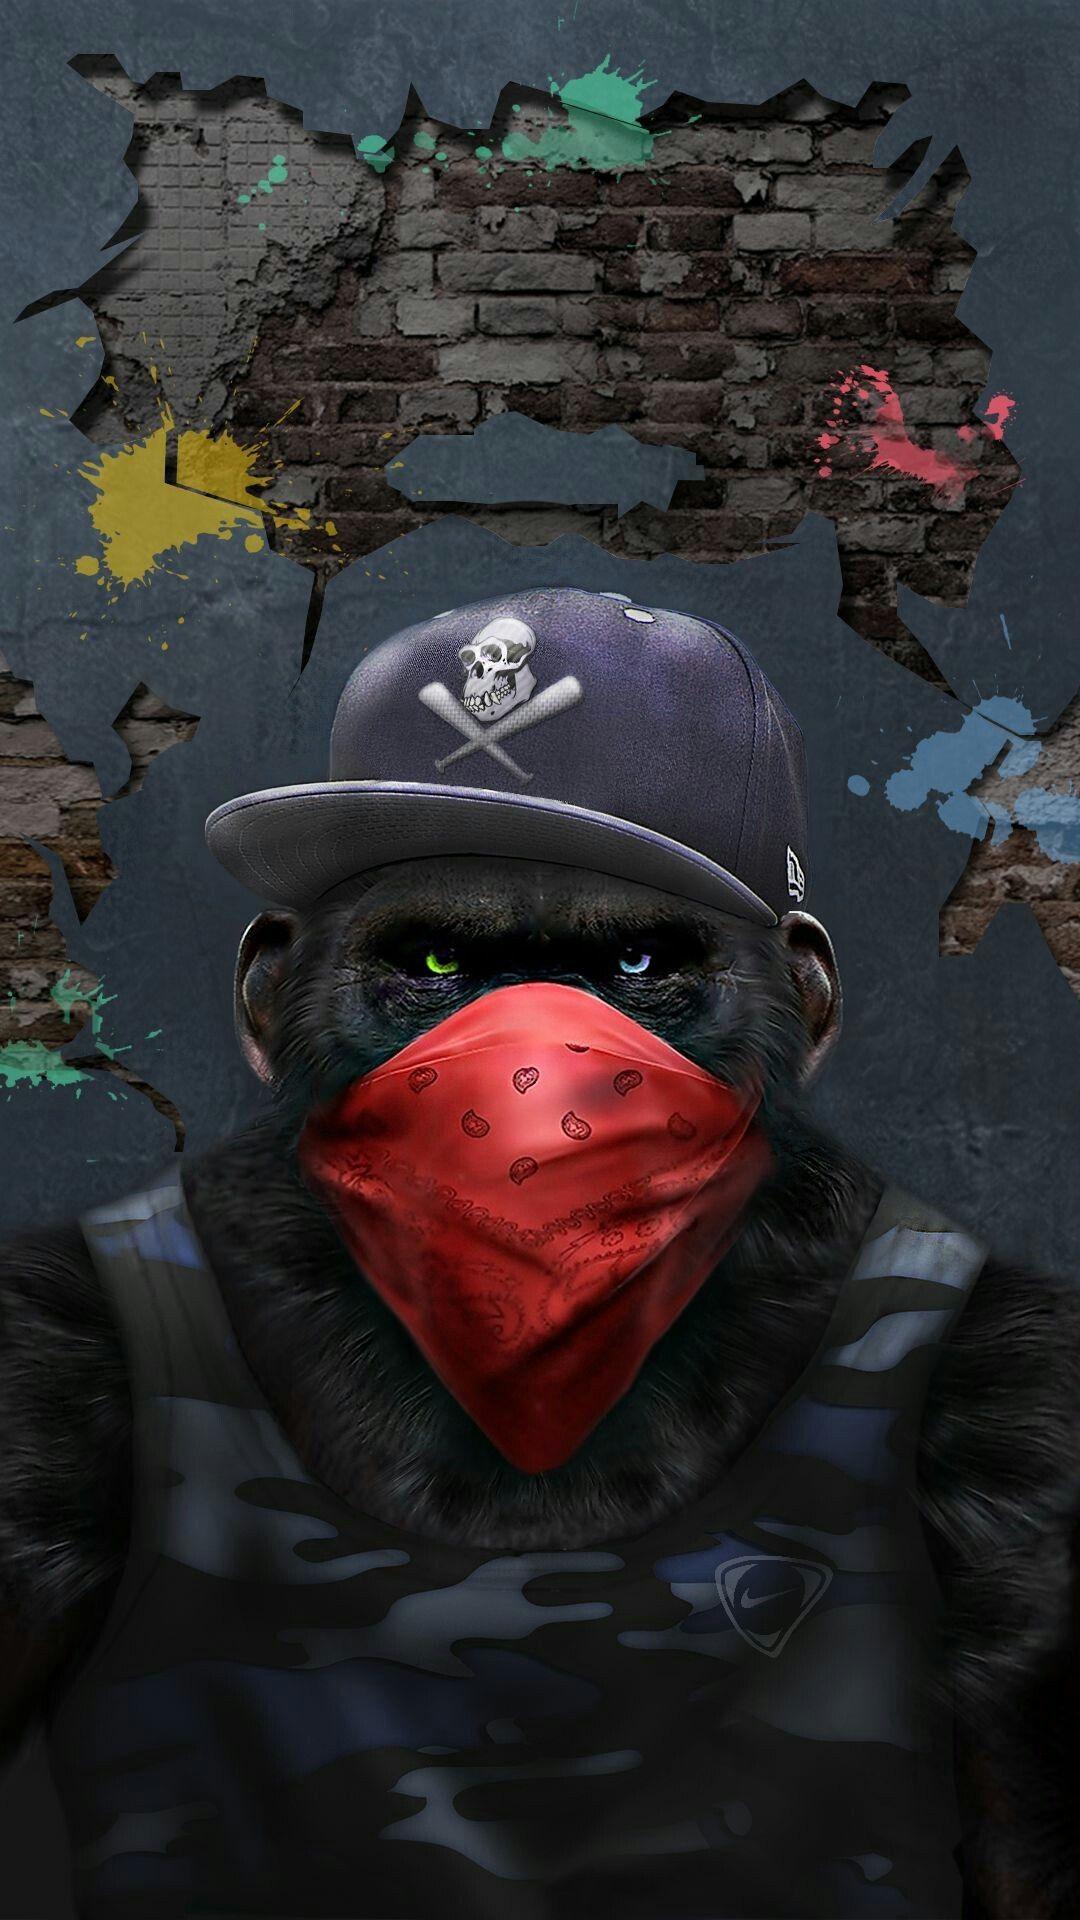 Dope Wallpapers Hd Gangster Monkey Iphone Wallpaper Iphoneswallpapers Com